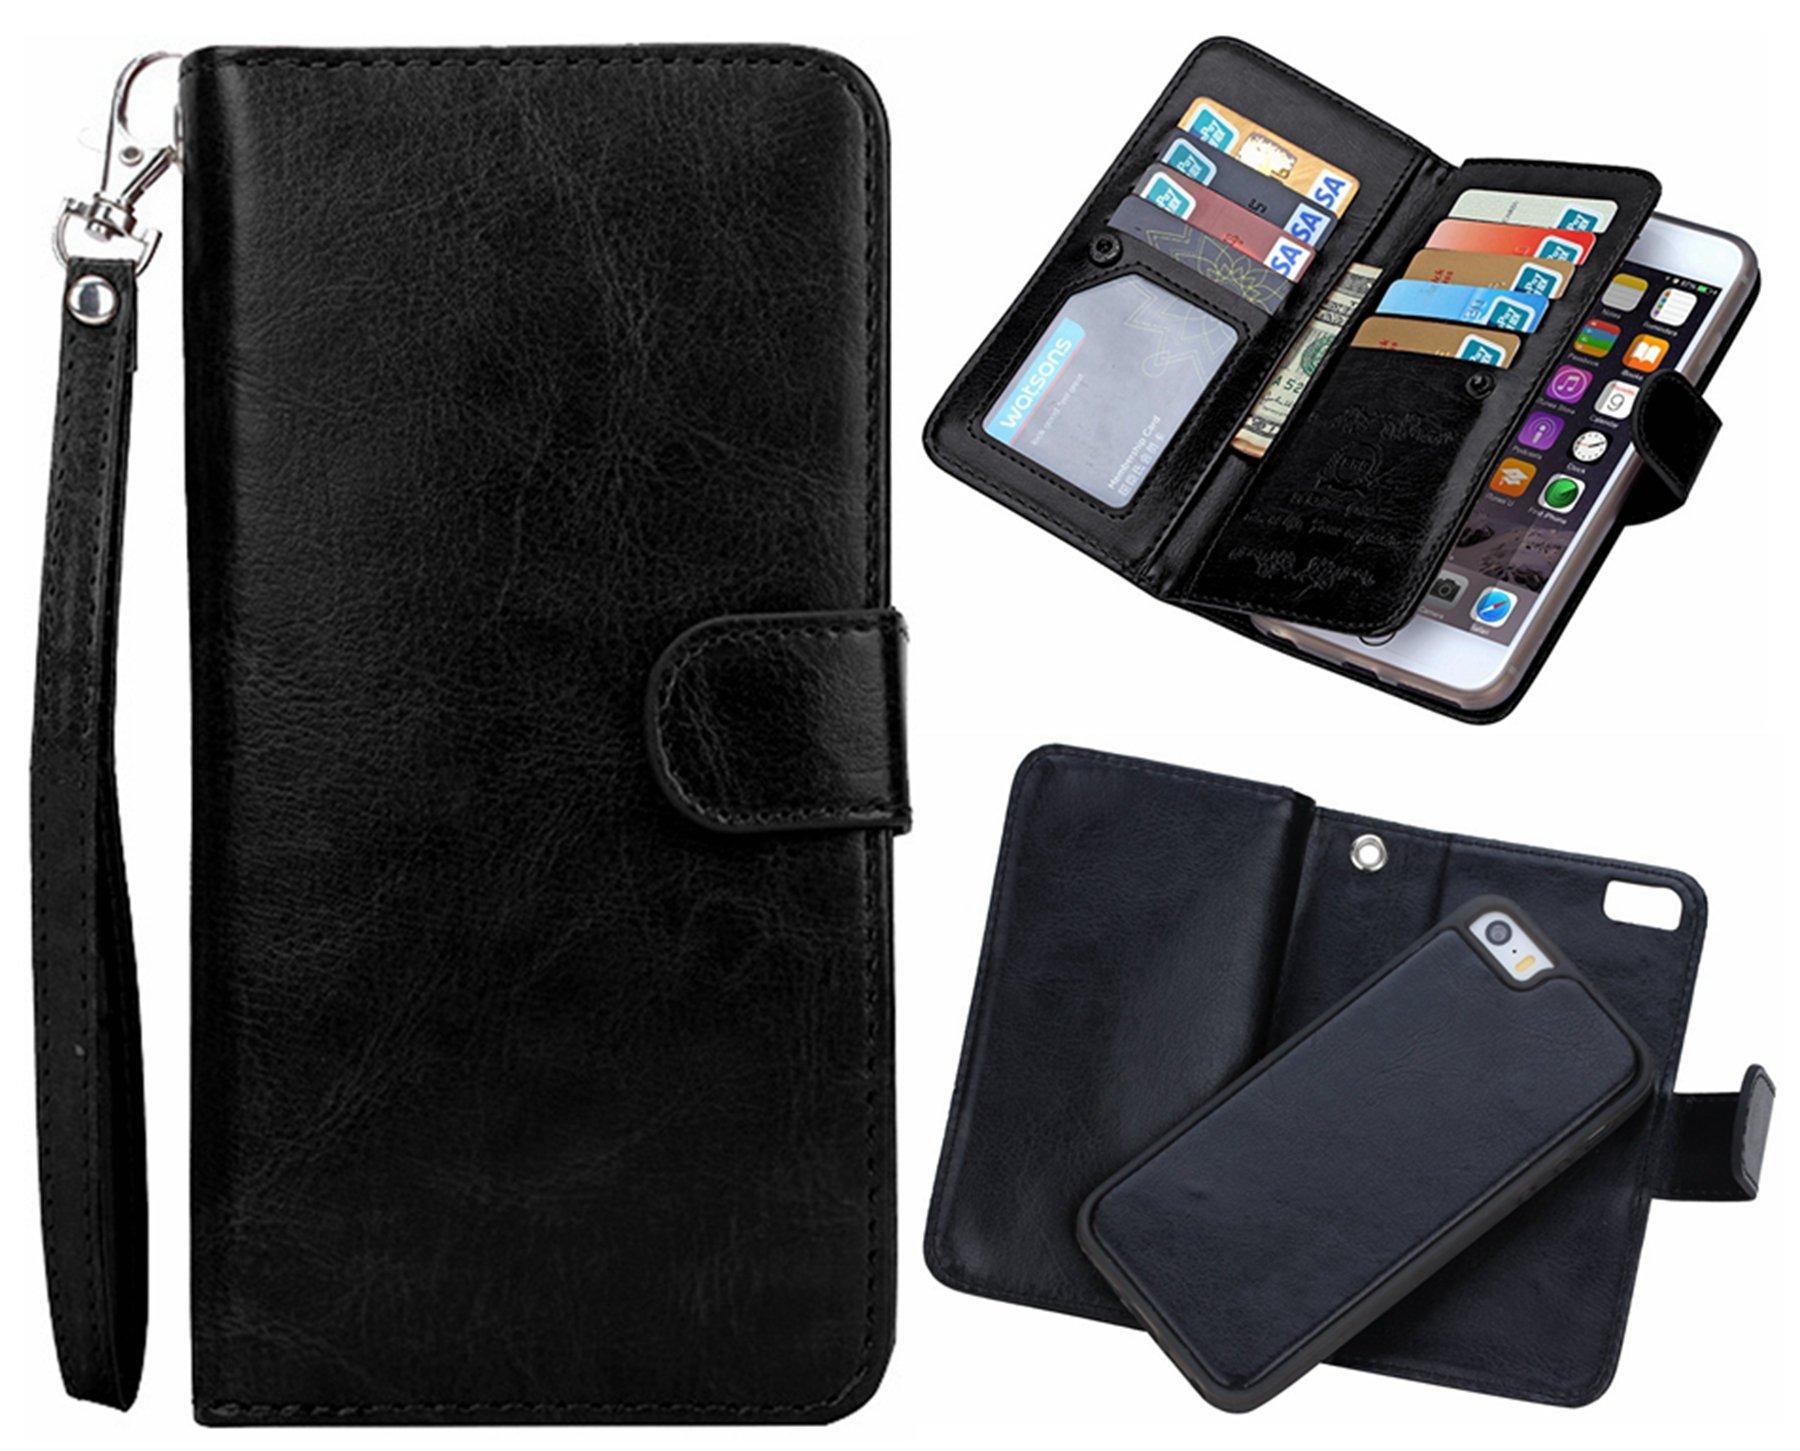 iPhone 6 plus/6S plus 2 in 1 Wallet Case,Hynice Folio Flip PU Leather Case Magnetic Detachable Slim Back Cover Card Holder Slot Wrist Strap wallet for iPhone 6 plus/6S plus 5.5'' (black)